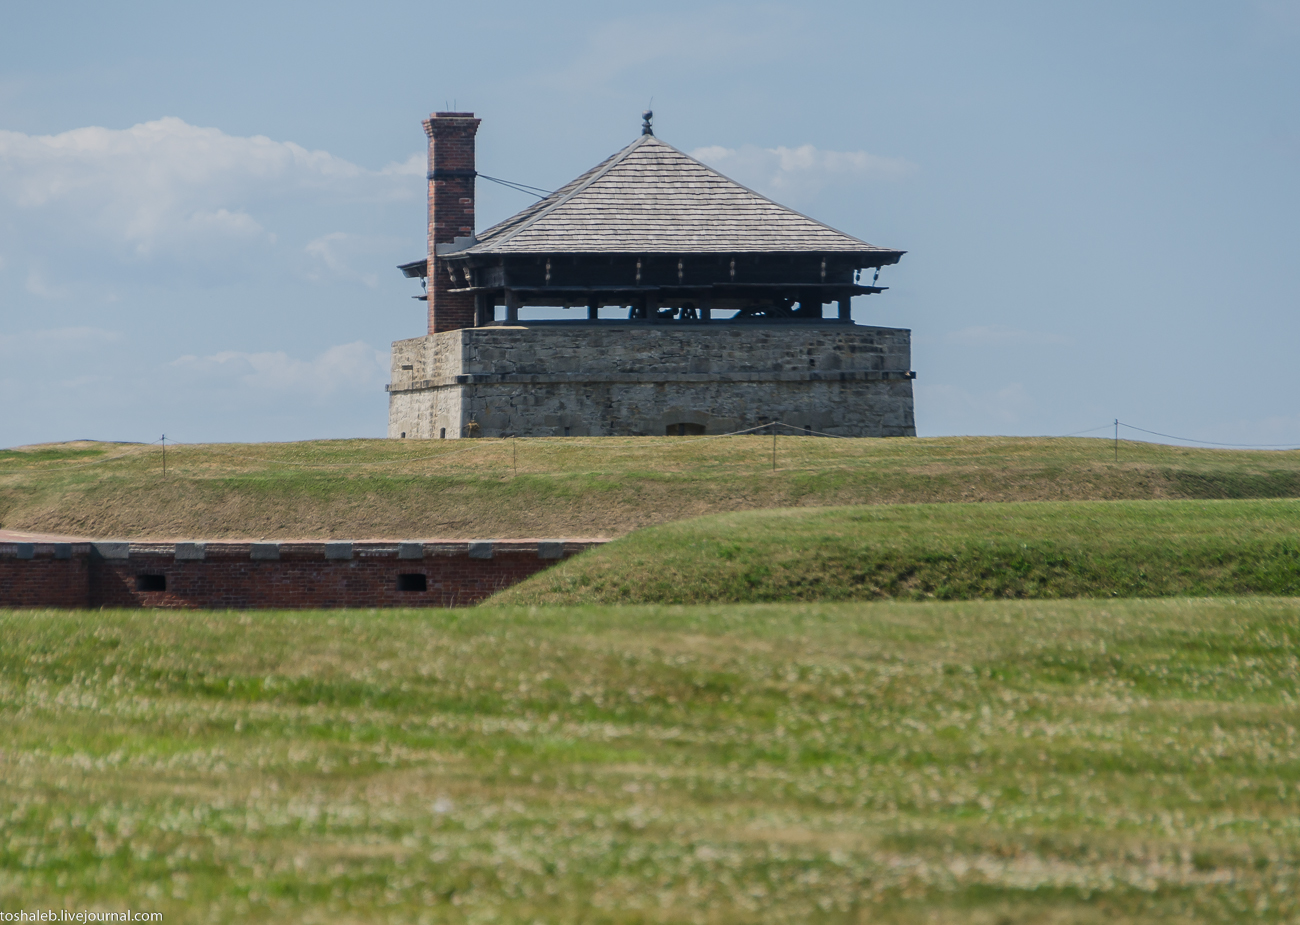 Niagara_Fort&Park-6